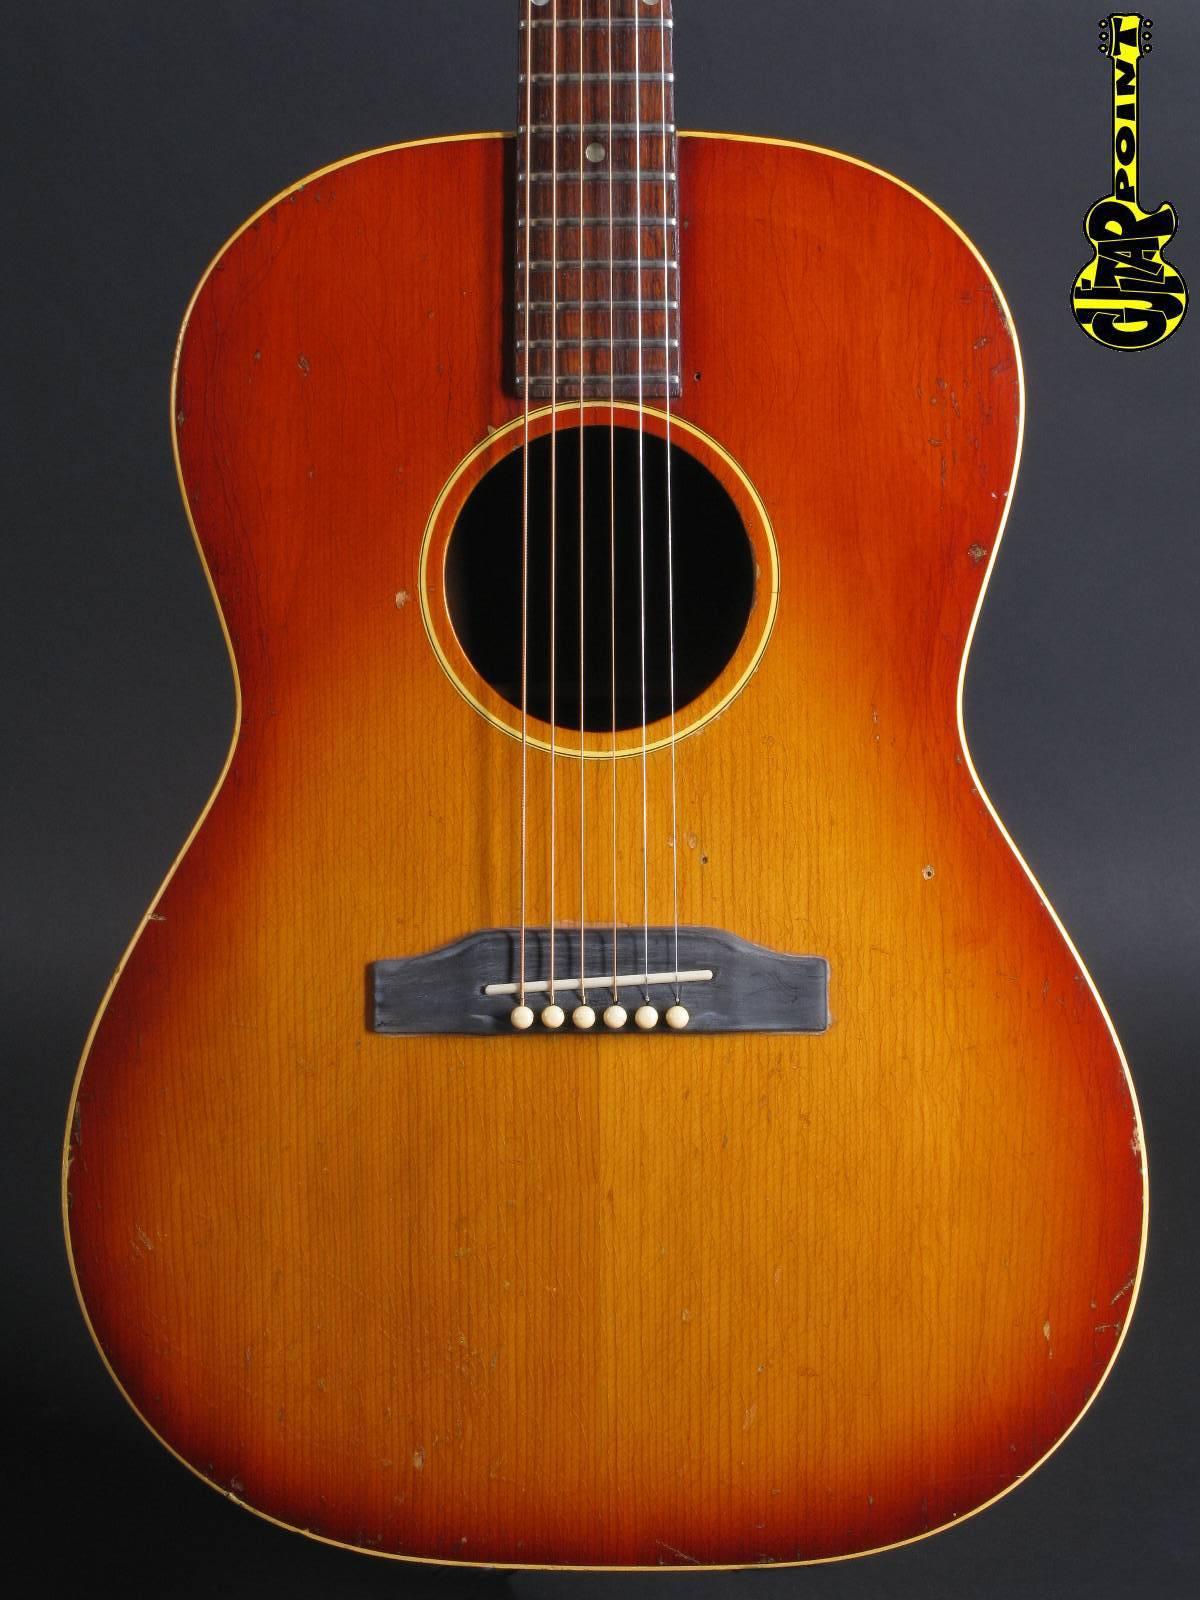 1965 Gibson B-25 - Sunburst